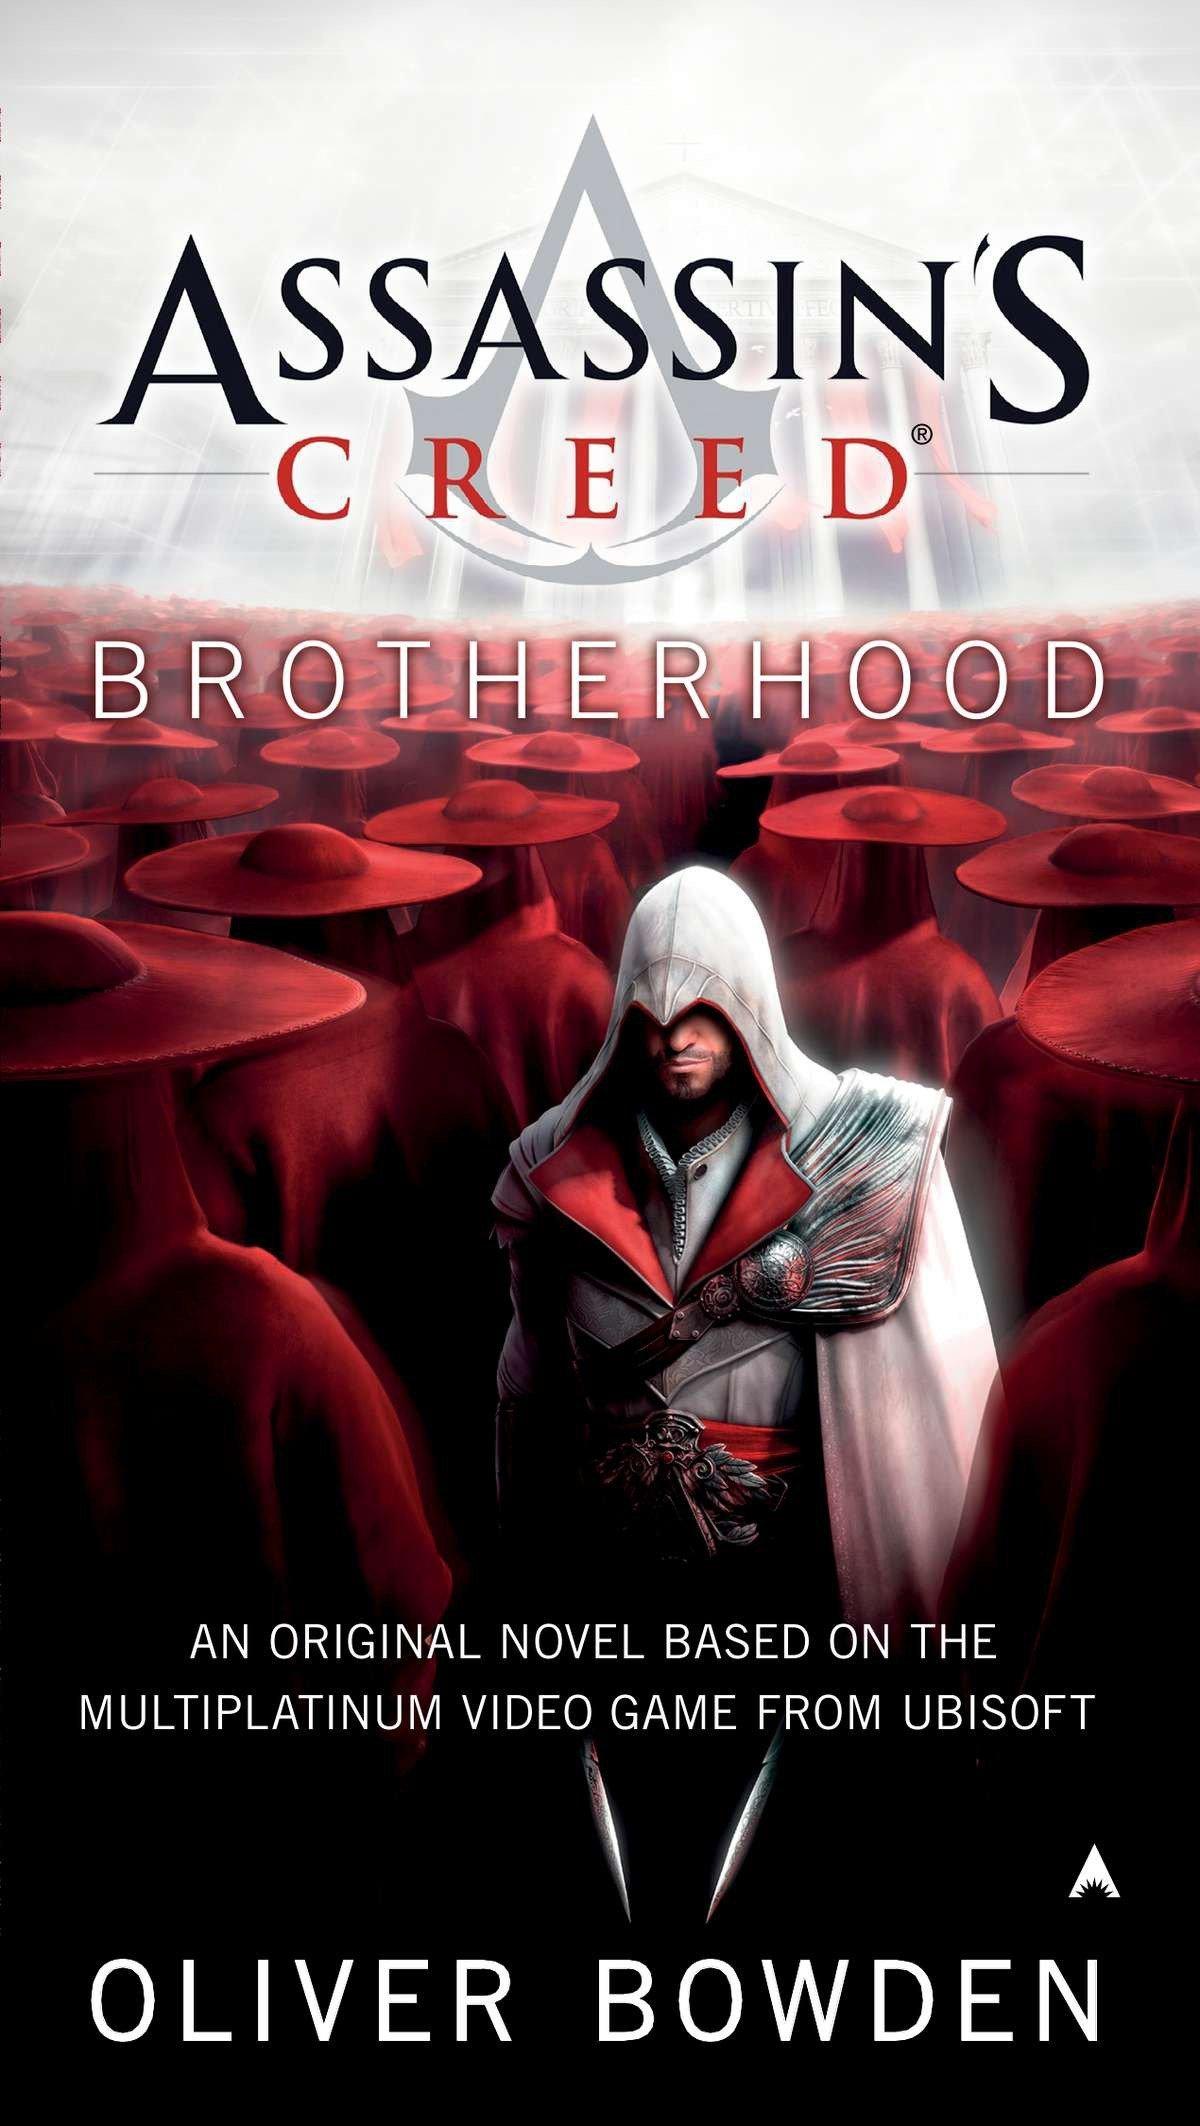 assassins creed books